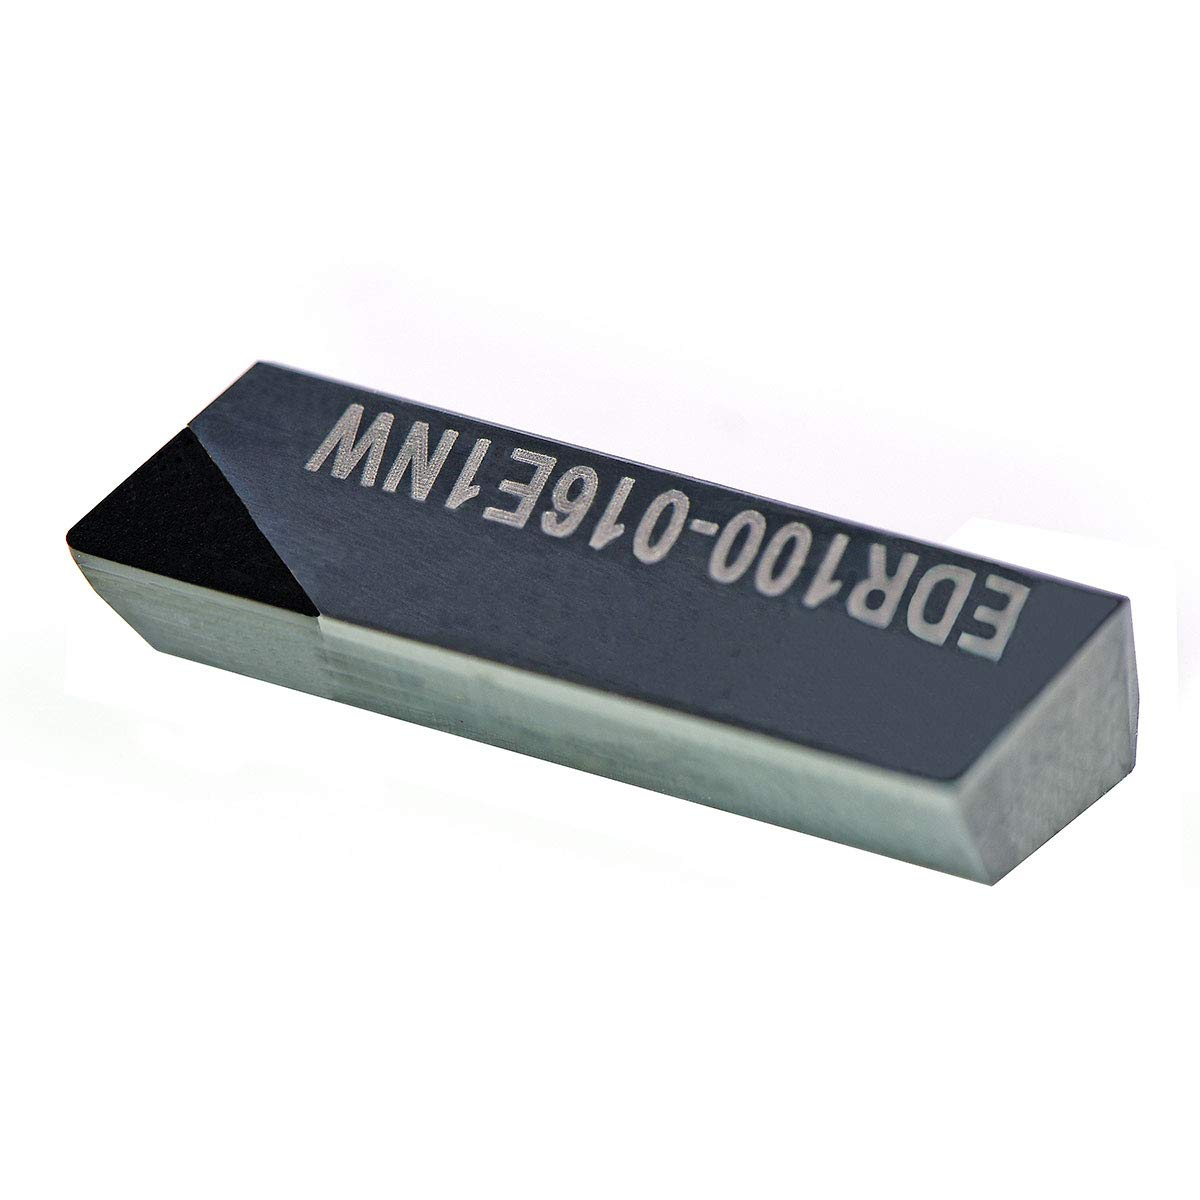 MAXTOOL [Alternative dealer] 10PCs EDR100-016-E1-NW PCD Ranking integrated 1st place Tip Inserts Milling DOV-LOK P